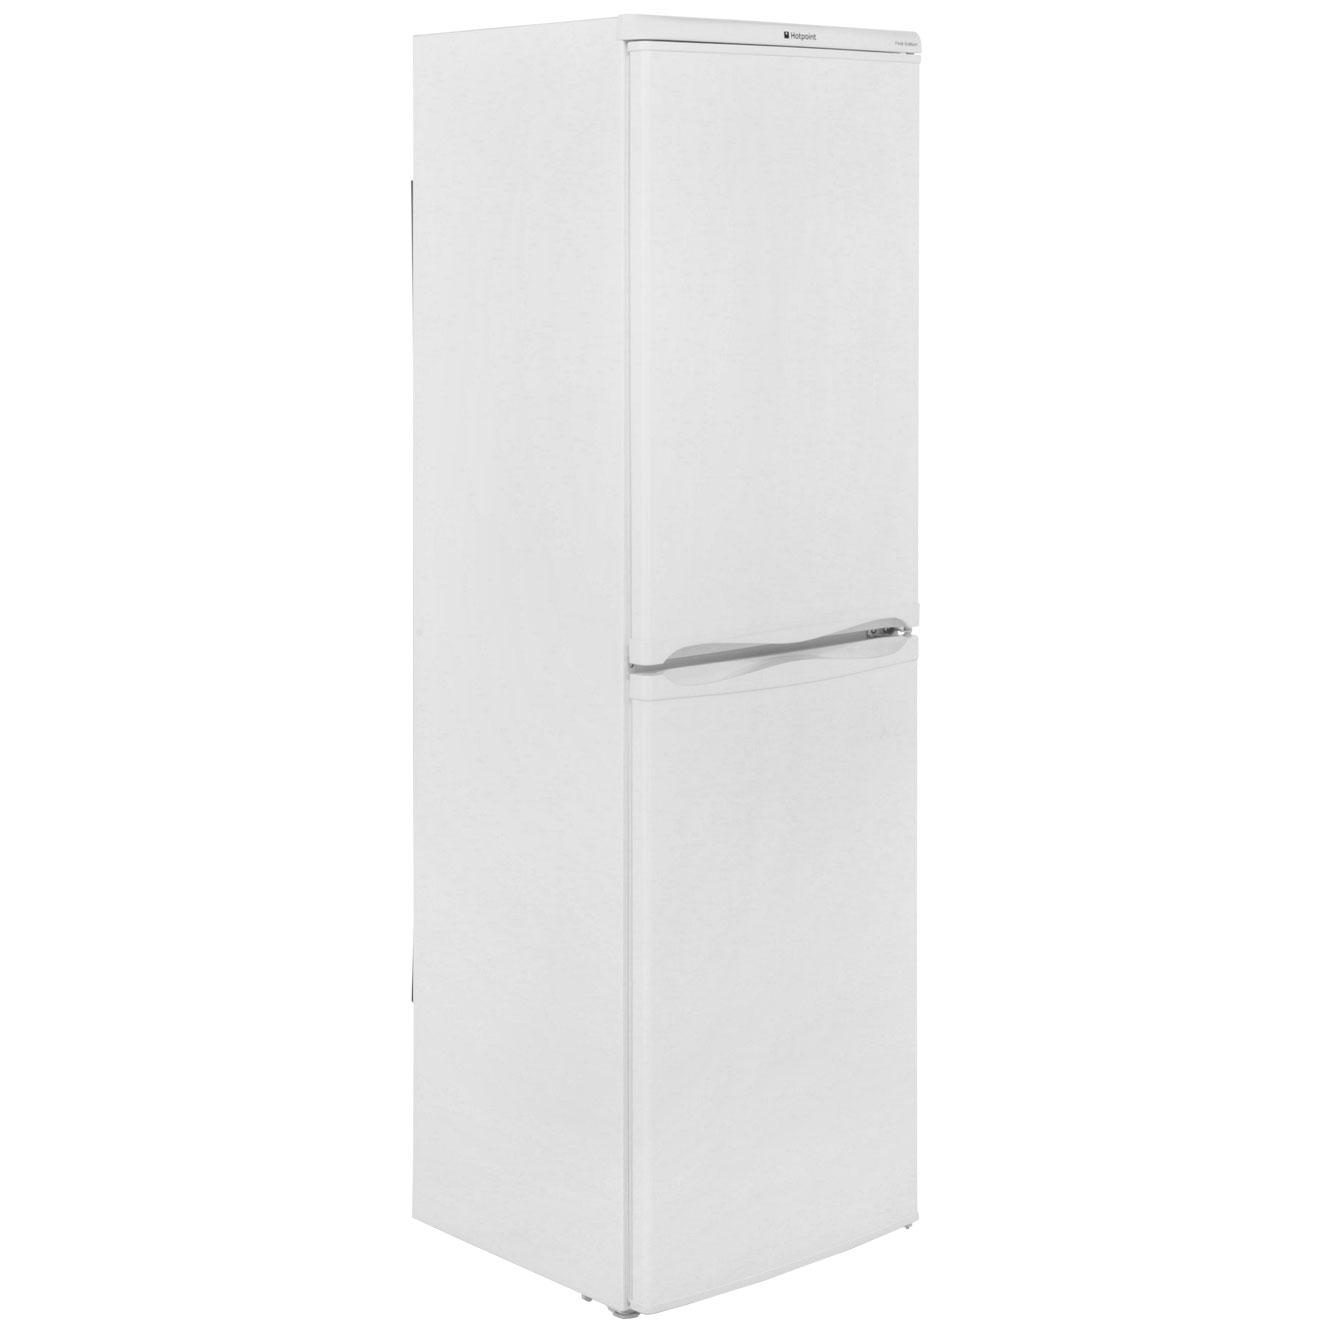 Hotpoint First Edition Rfaa52p Fridge Freezer White